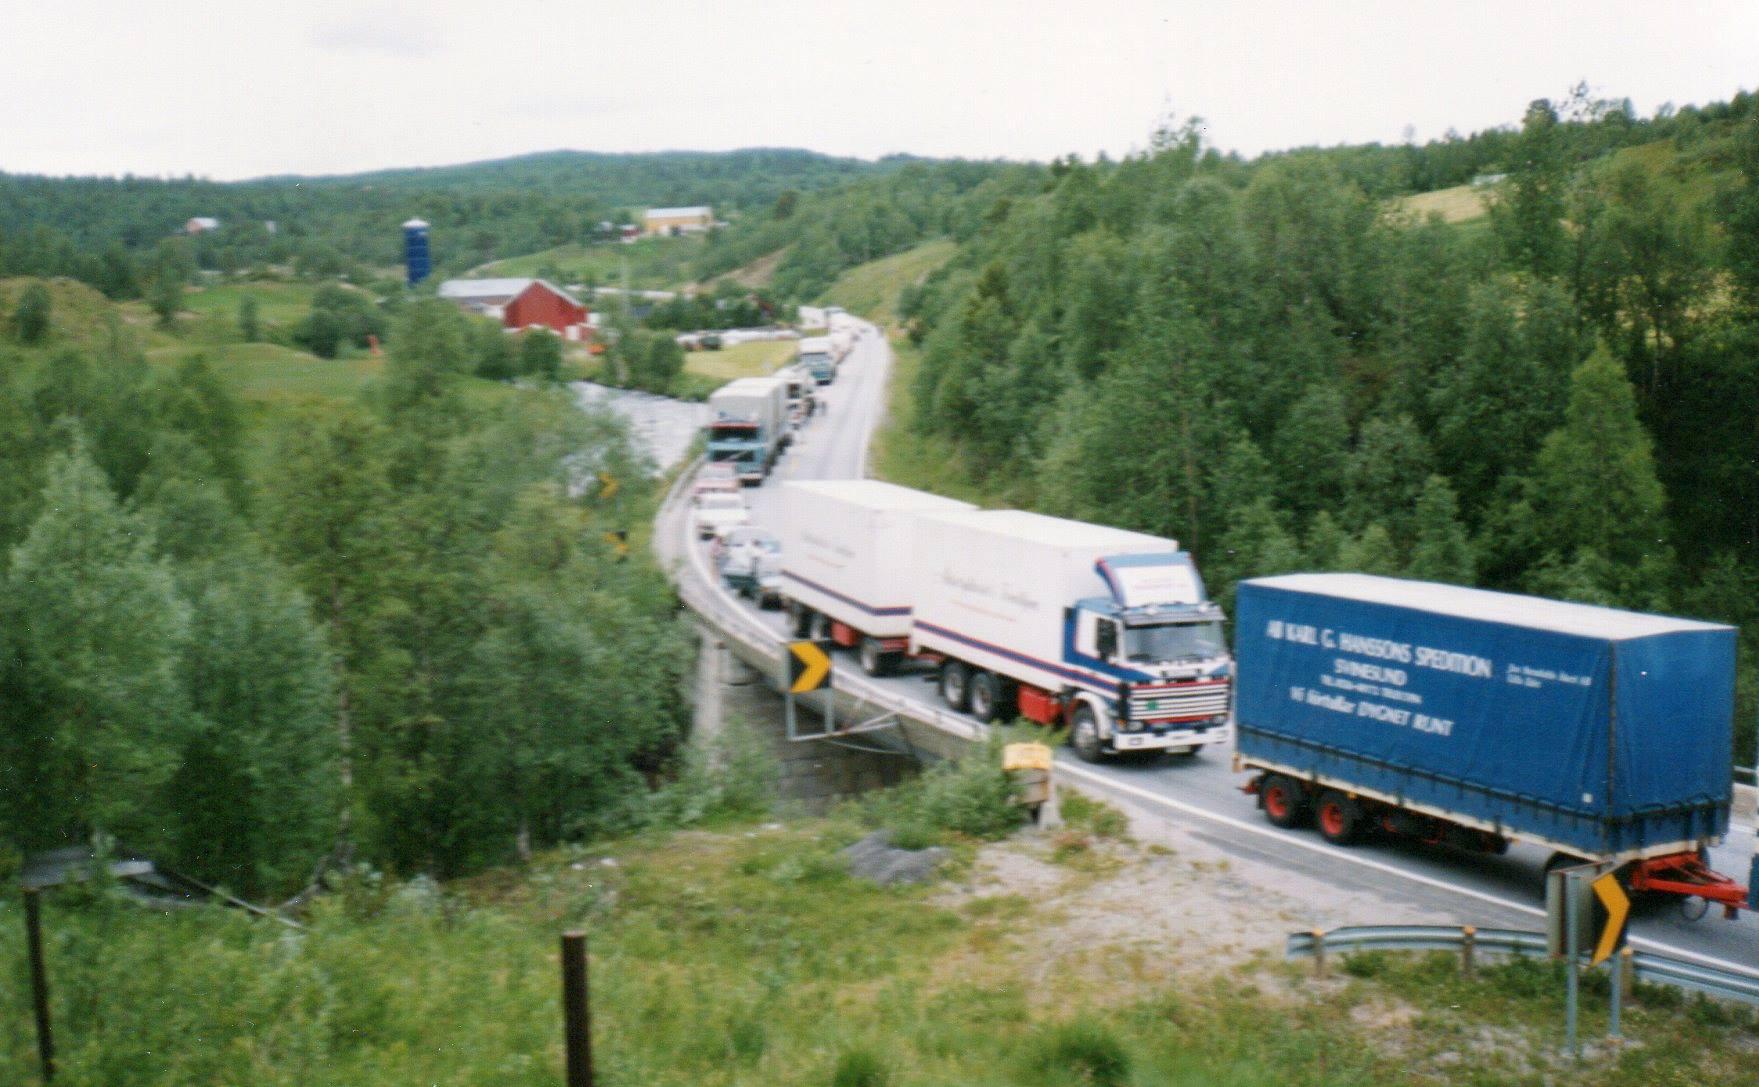 Arne-Sommervold-photo-5